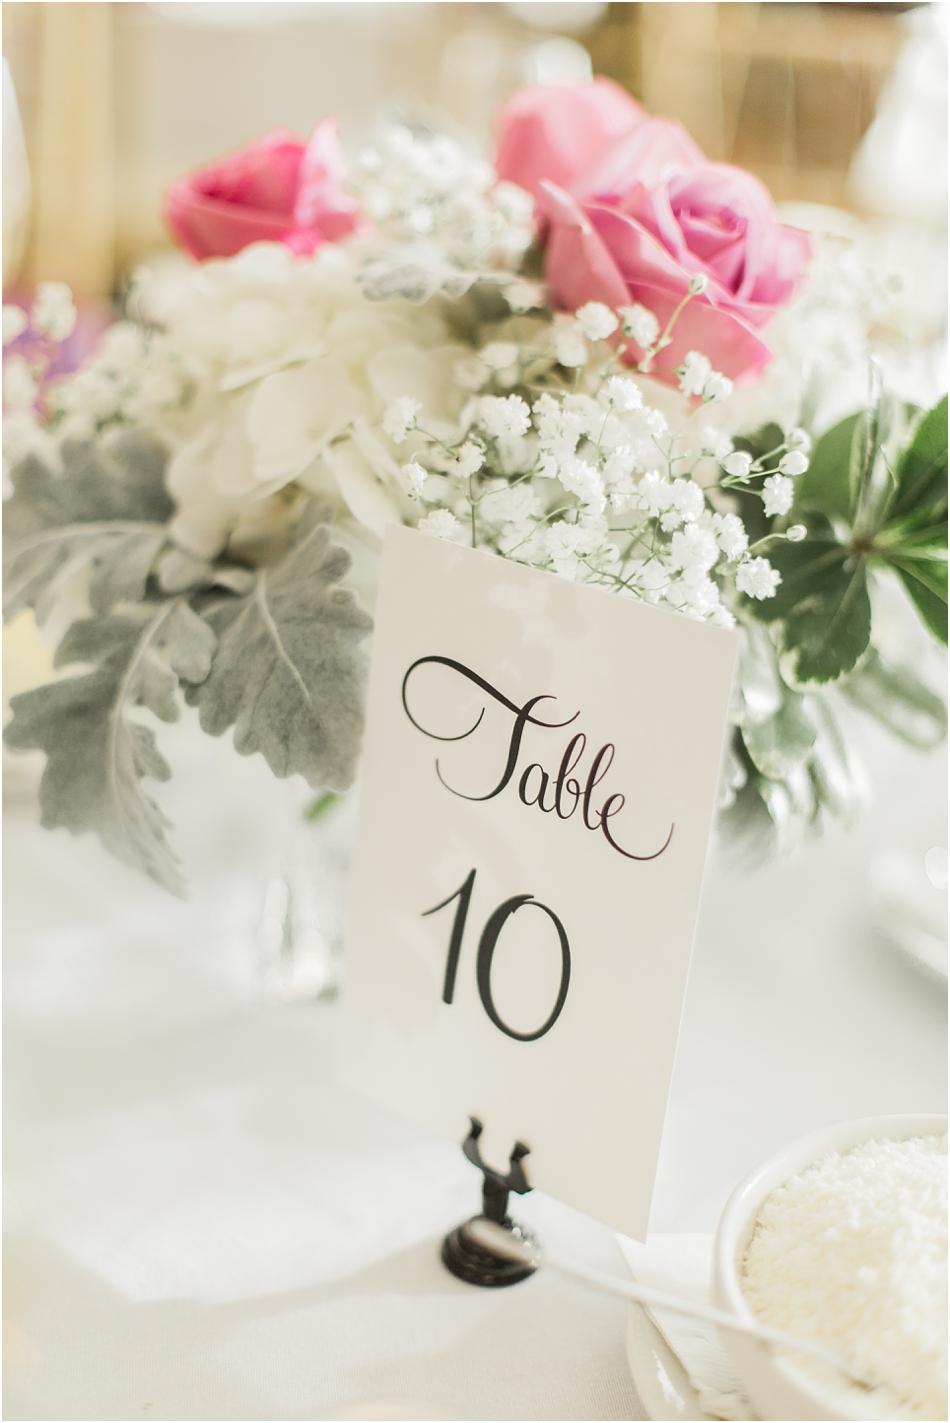 north_reading_lauren_sal_ballroom_cape_cod_boston_new_england_wedding_photographer_Meredith_Jane_Photography_photo_0114.jpg